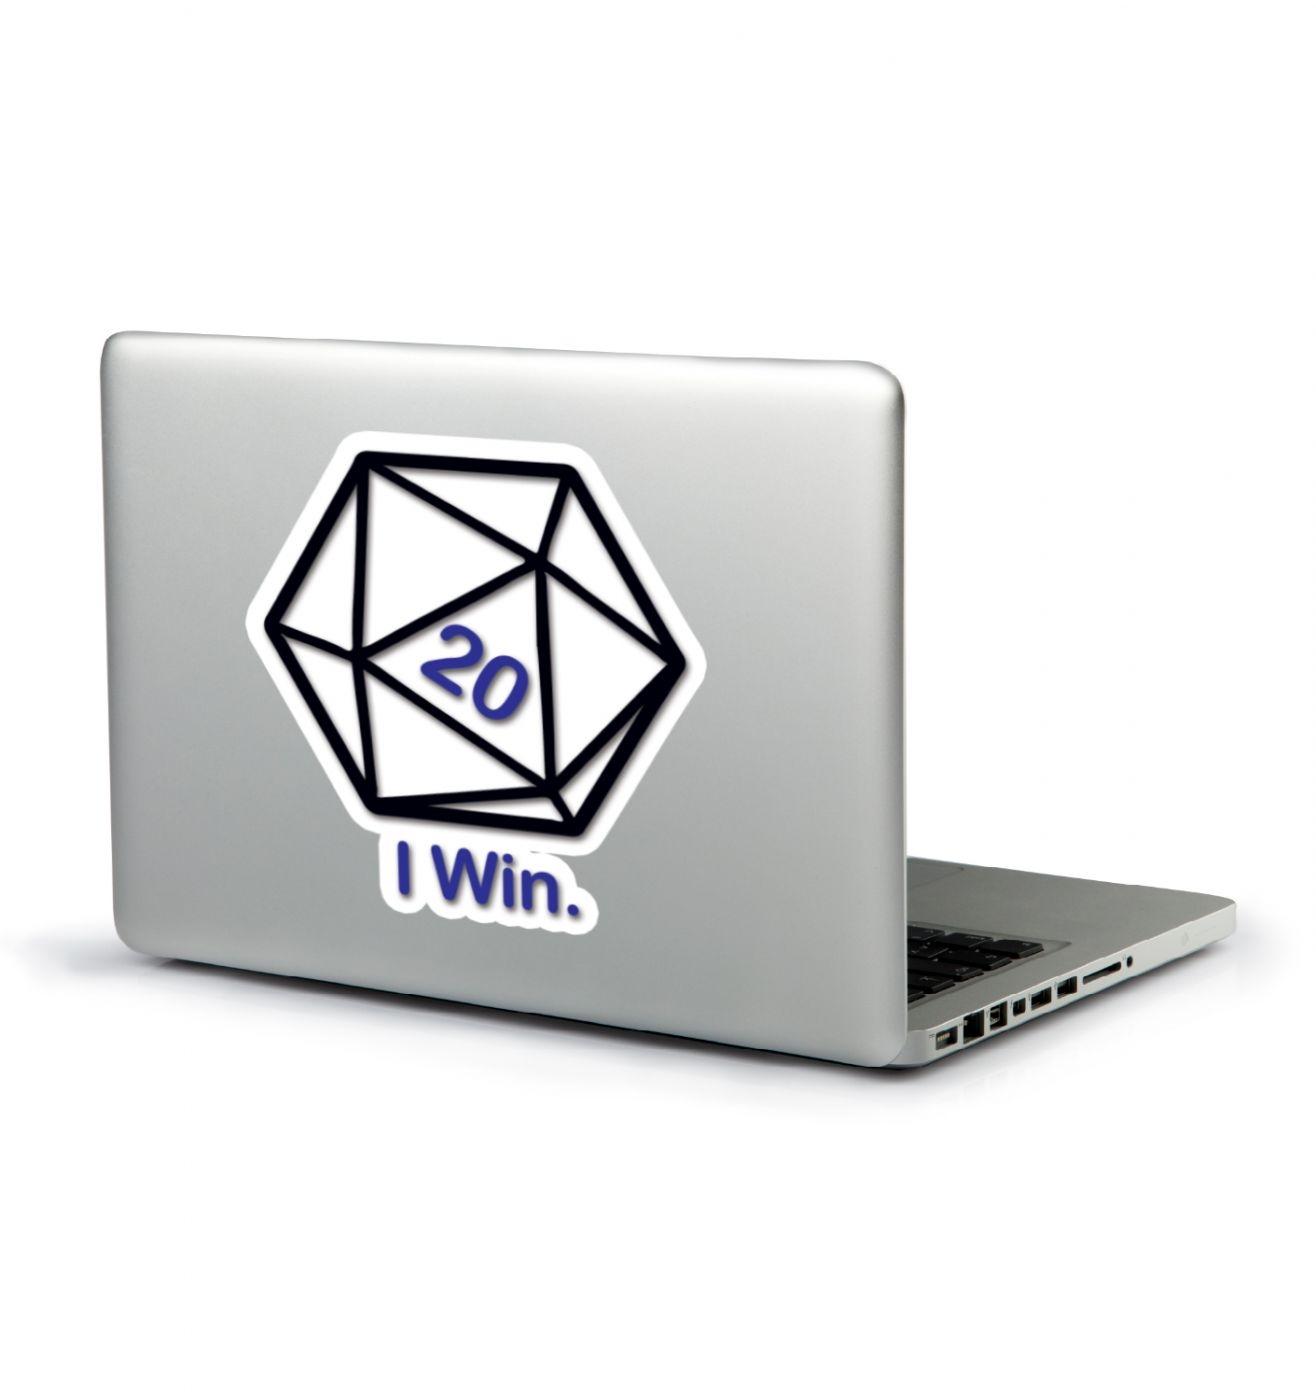 D20 I Win laptop sticker